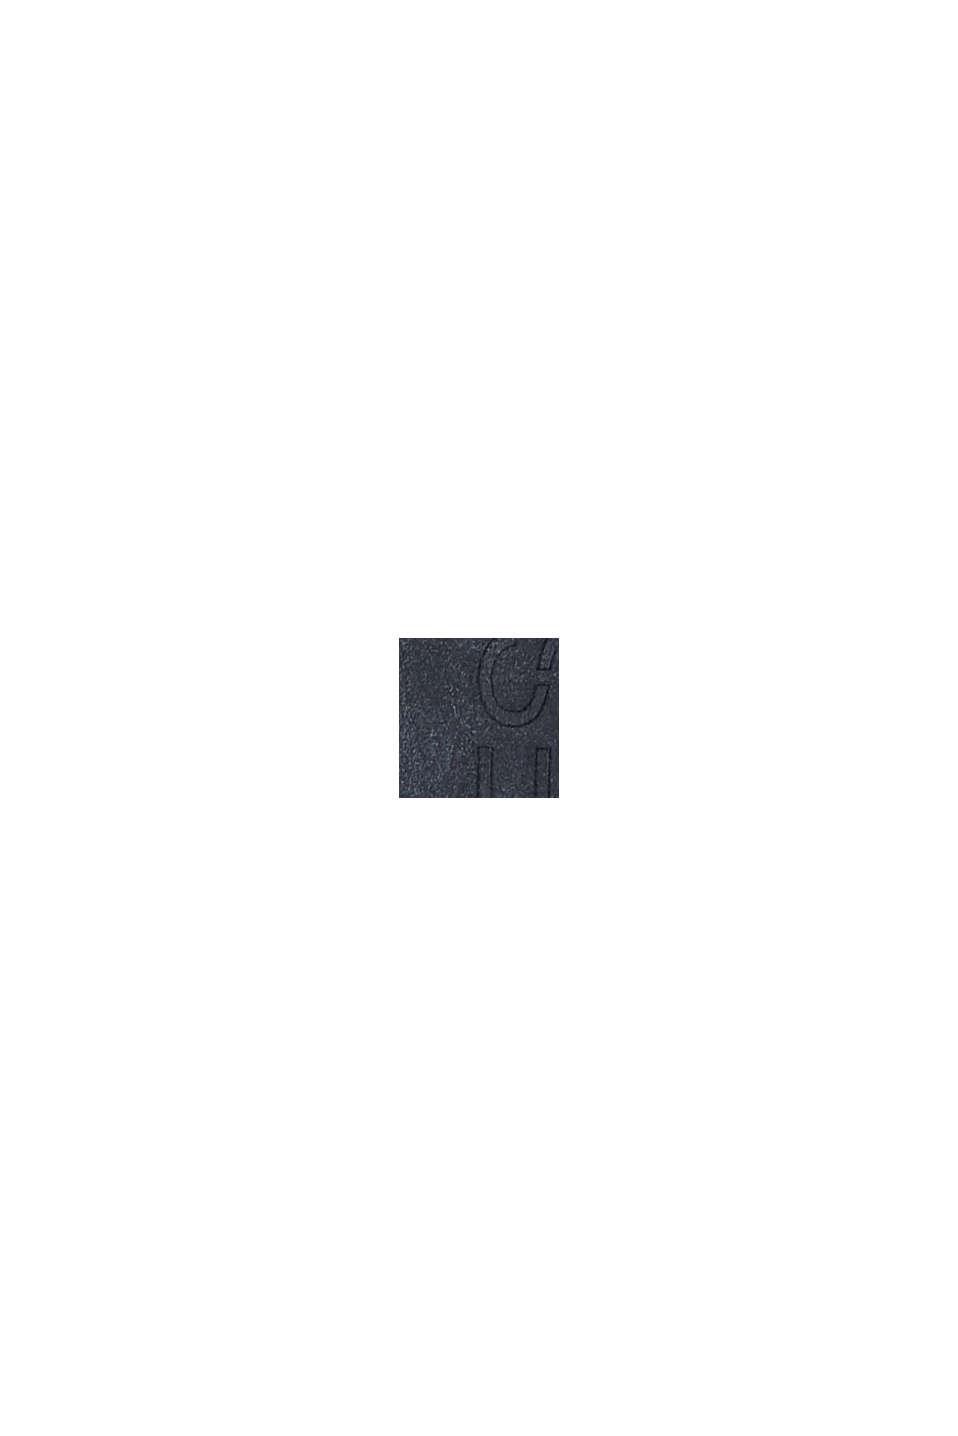 Infradito in materiale misto, DARK BLUE, swatch